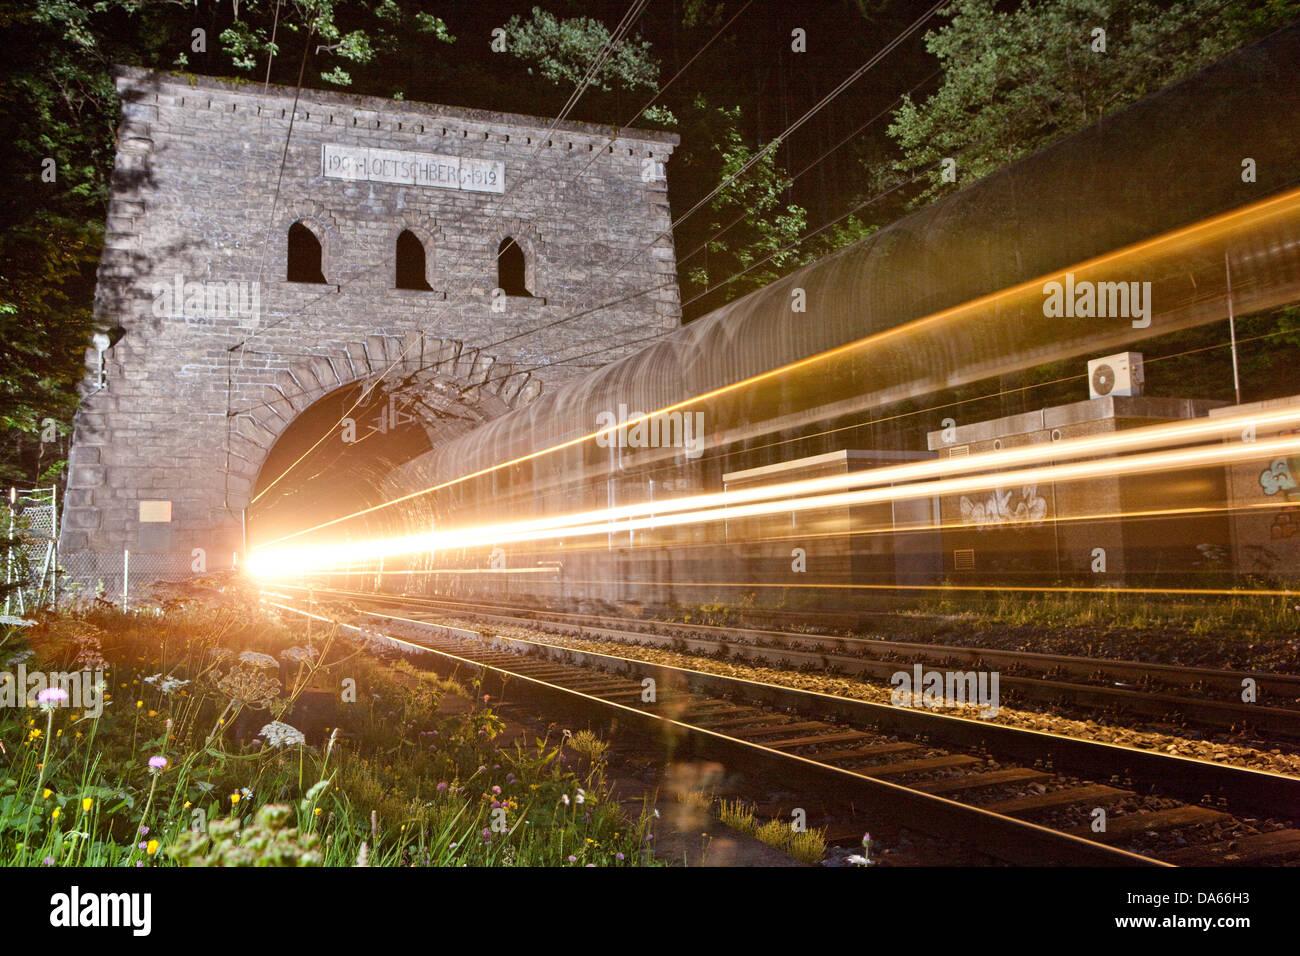 Haupteingang Nord, tunnel, Kandersteg, Straße, Bahn, Zug, Eisenbahn, Lötschberg, BLS, Schweiz, Europa, Stockbild